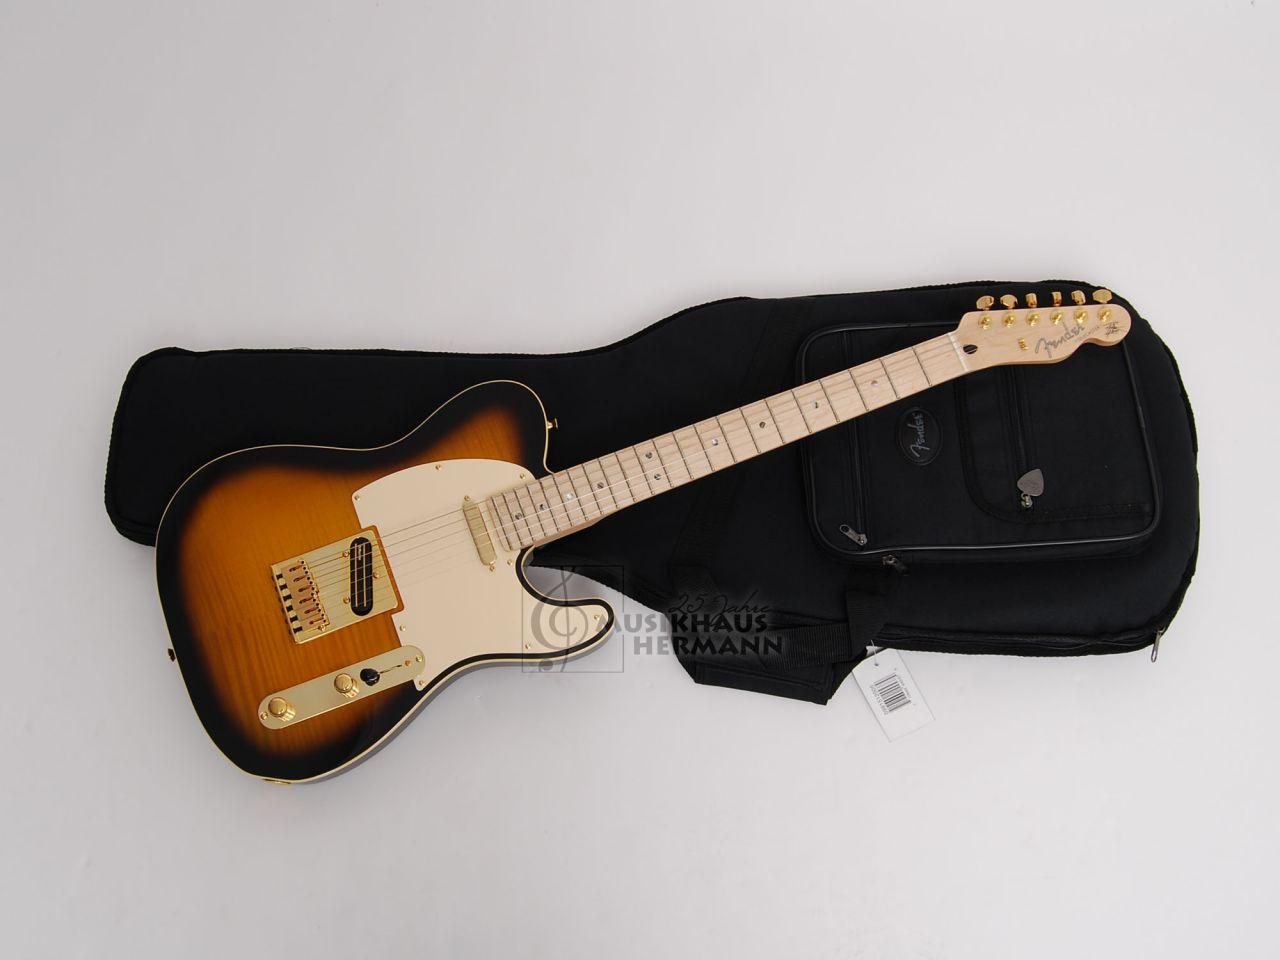 Fender Richie Kotzen Telecaster Brown Sunburst 0255202532